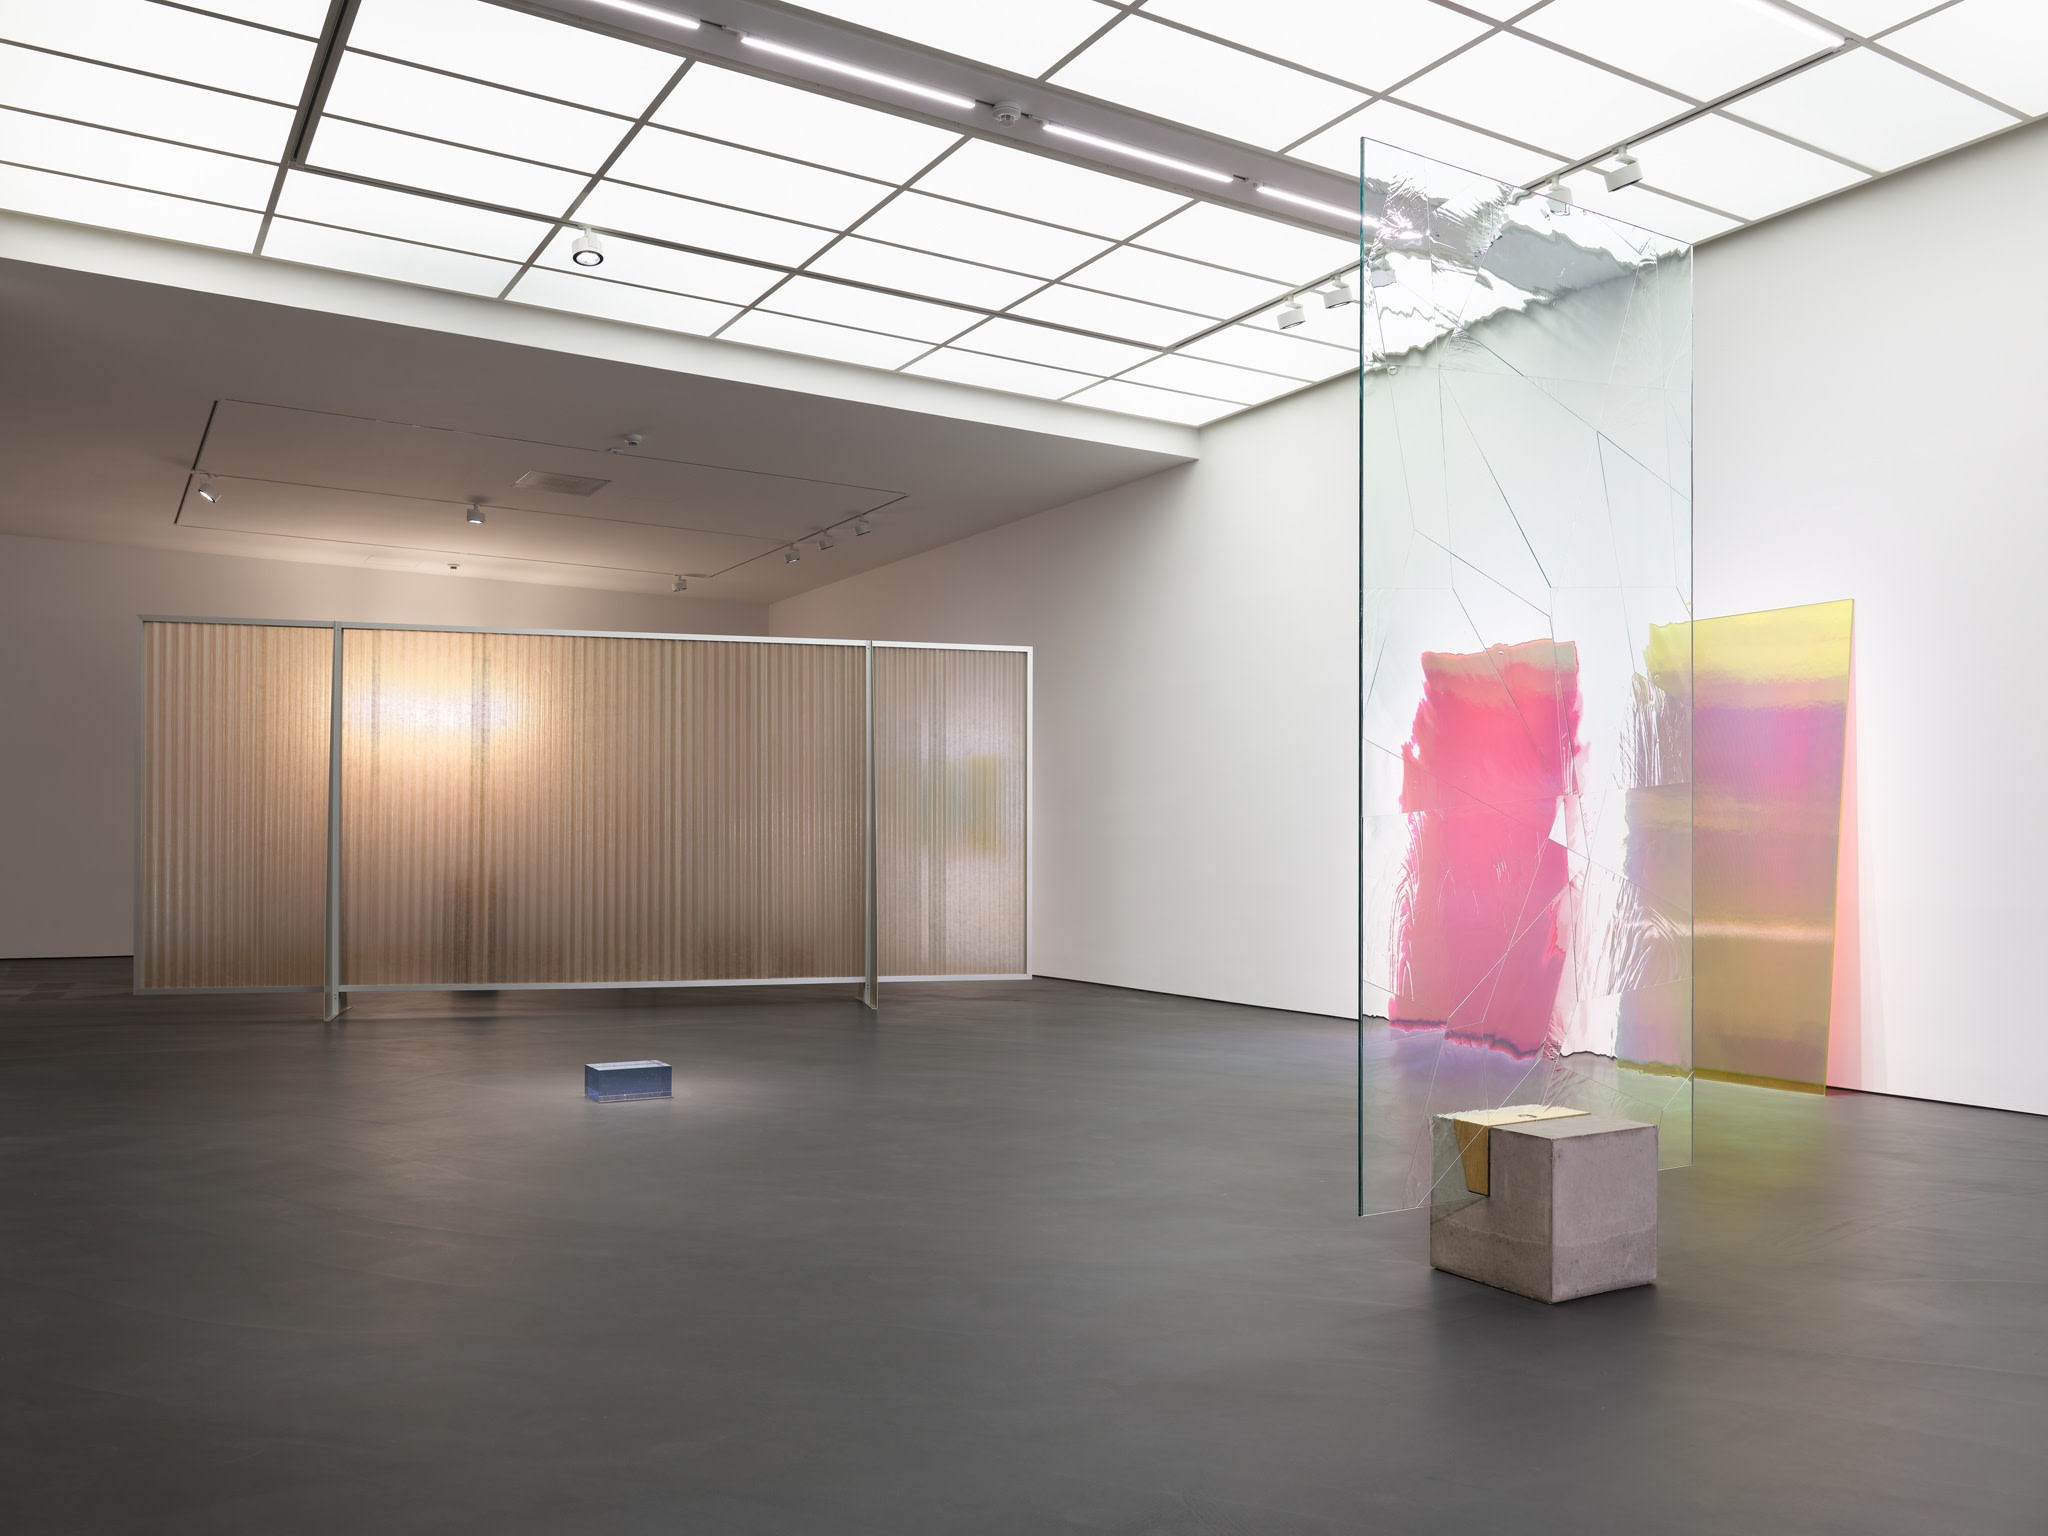 Ausstellungsansicht: PS81E, Esther Schipper, Berlin, 2020. Foto © Jörg von Bruchhausen